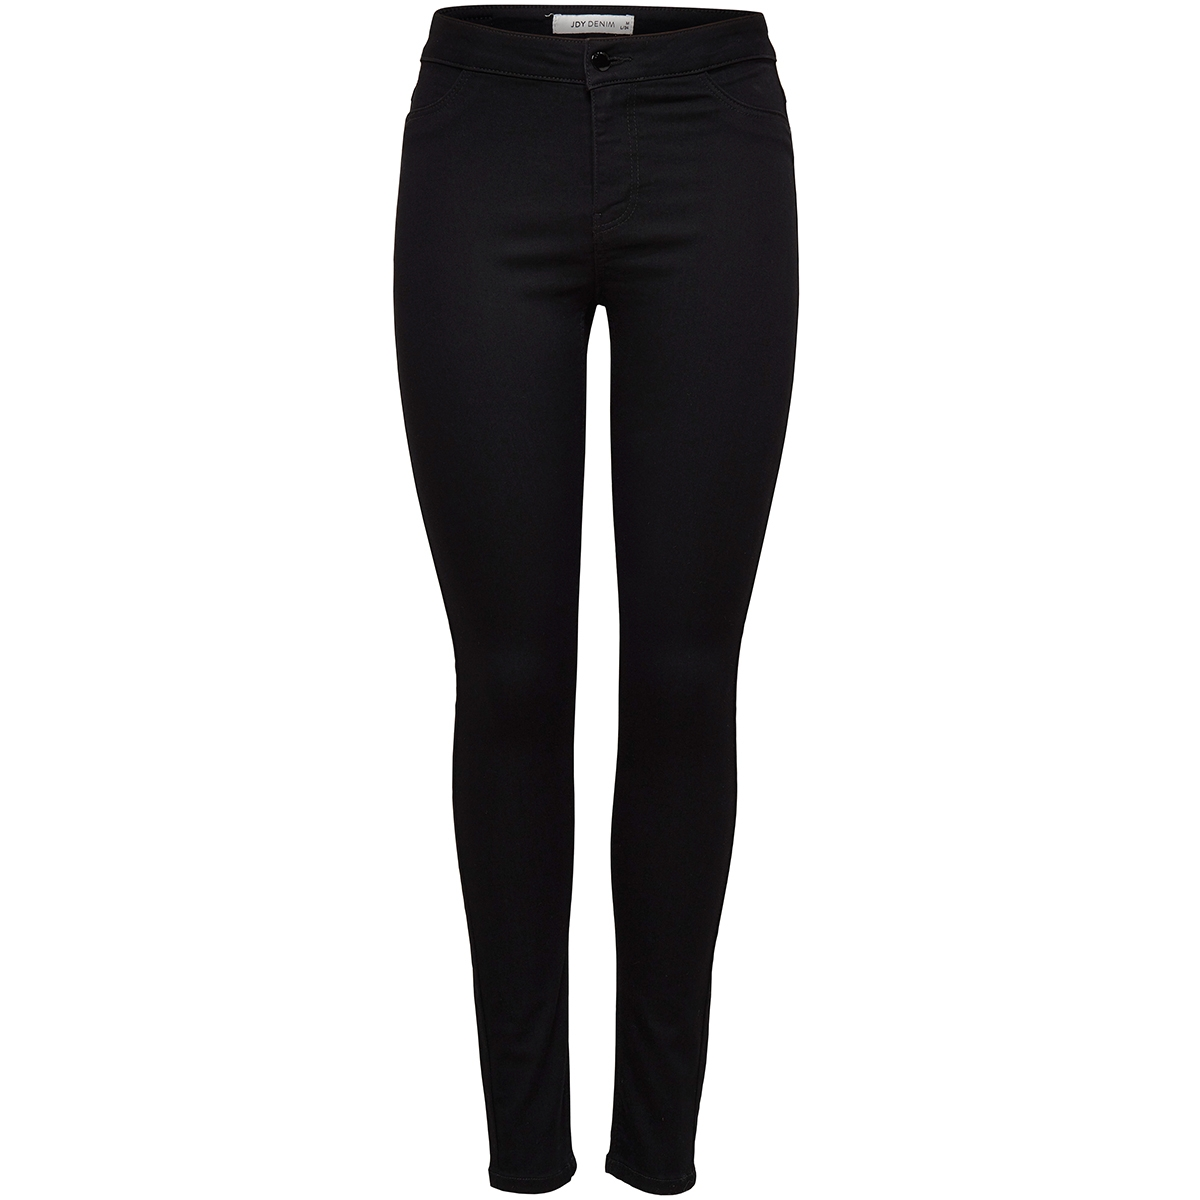 jdyella jegging rw black dnm noos 15161364 jacqueline de yong jeans black